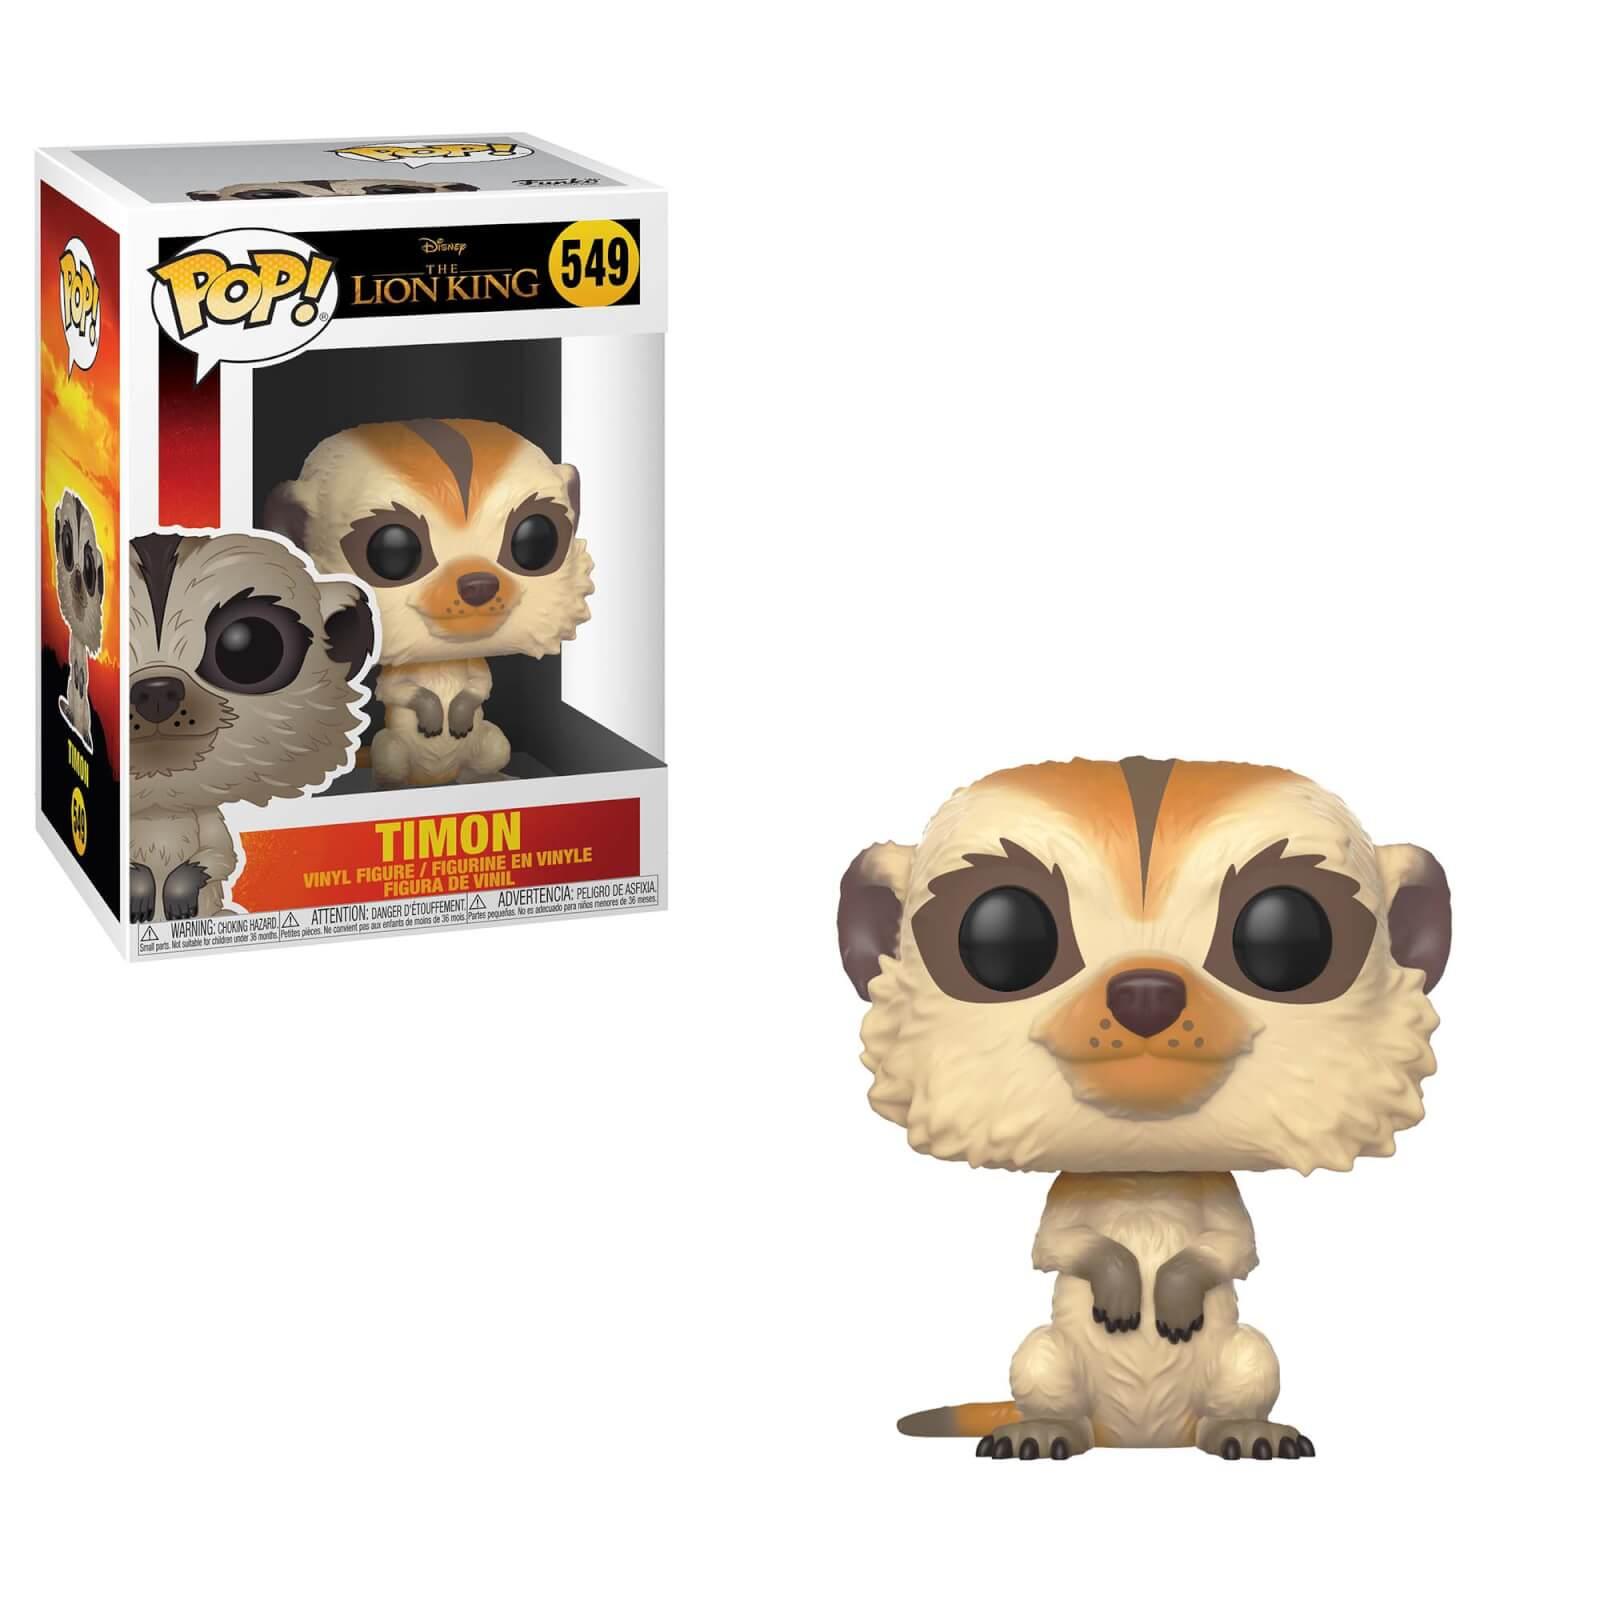 Disney The Lion King 2019 Timon Pop Vinyl Figure